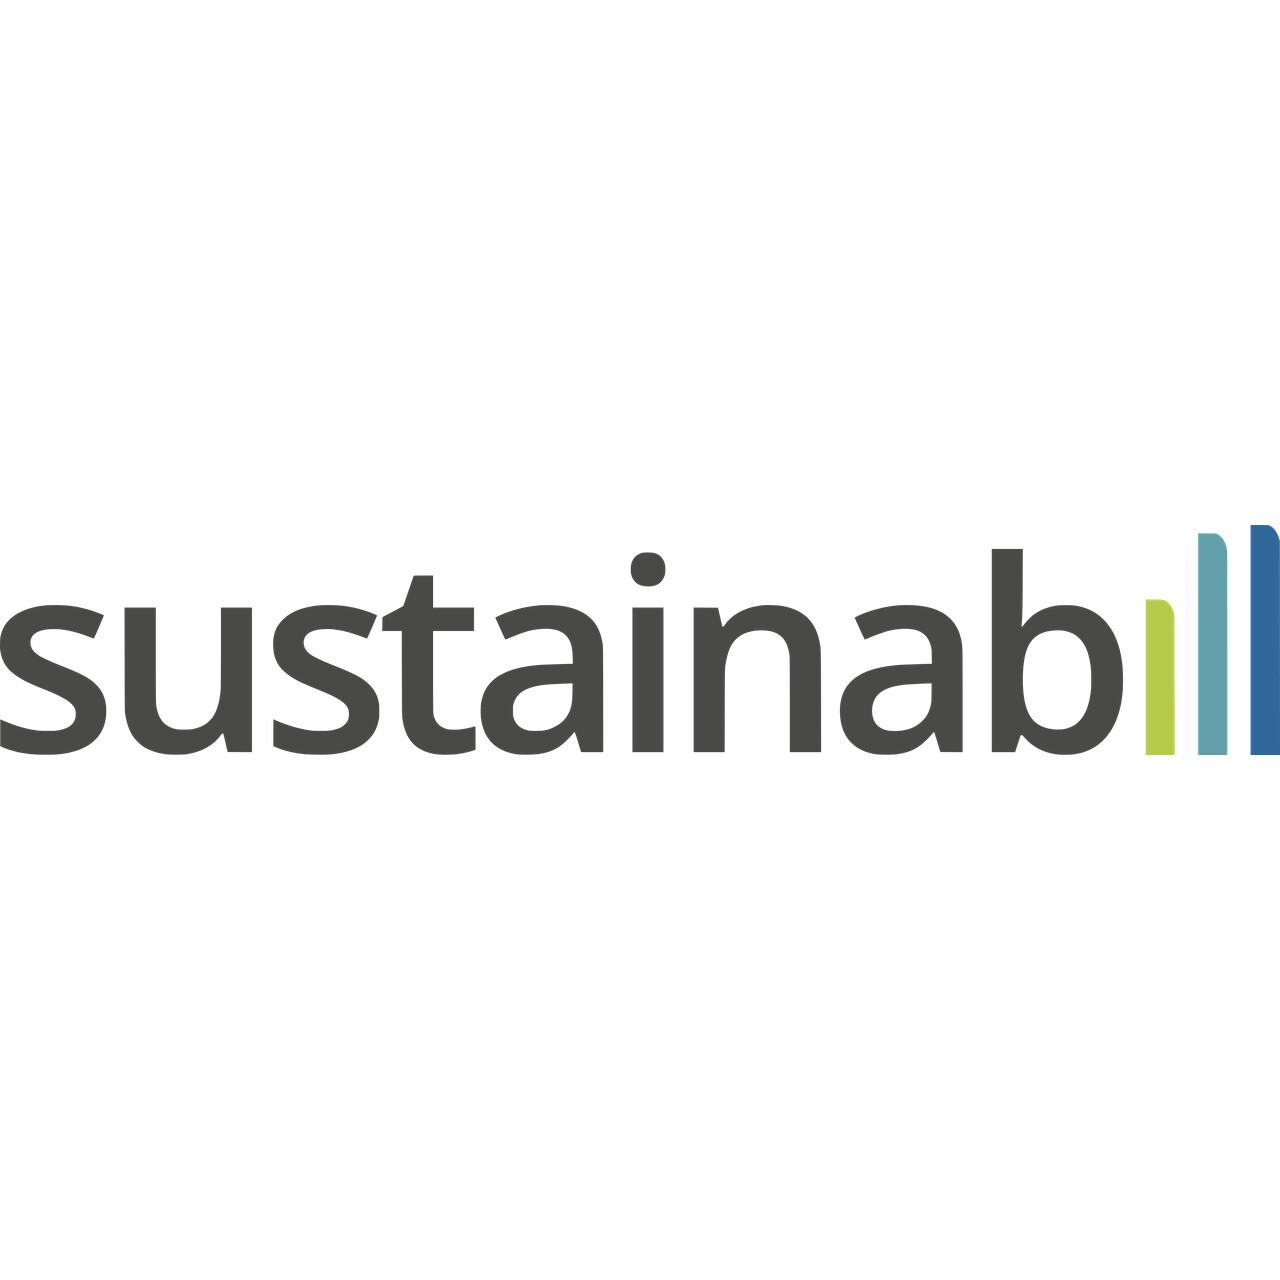 sustainabill GmbH